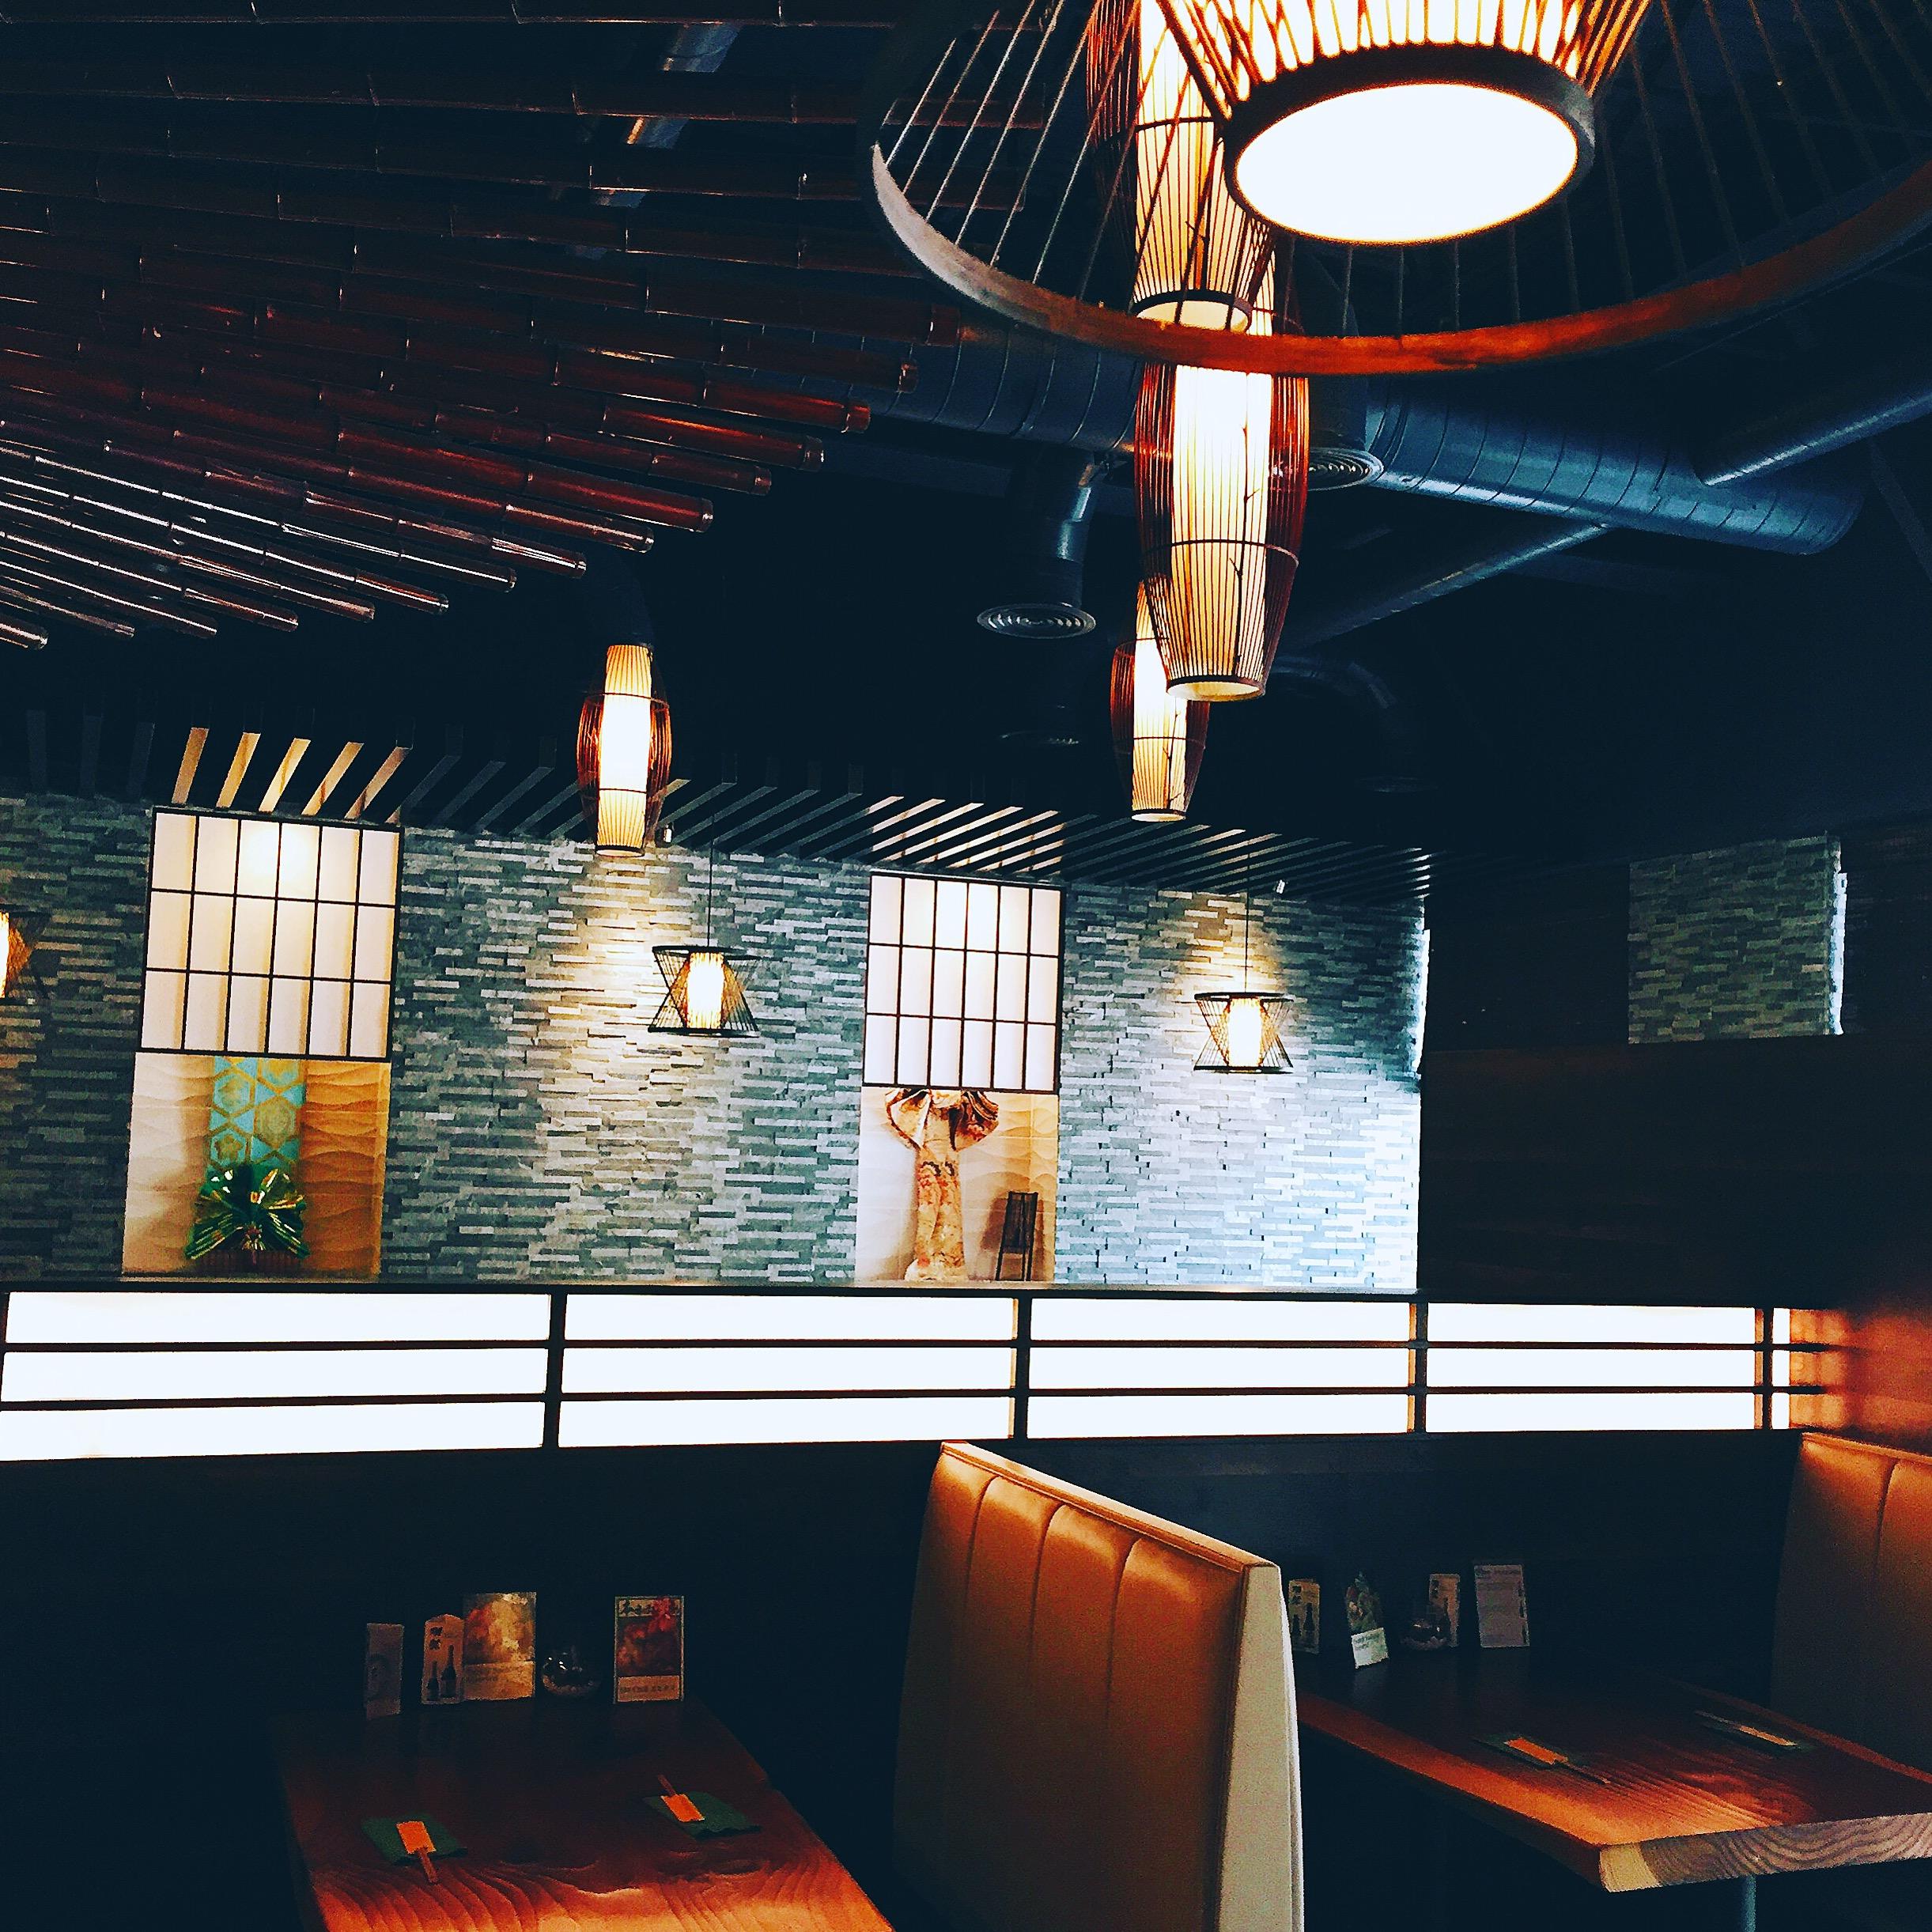 Japanese modern interior